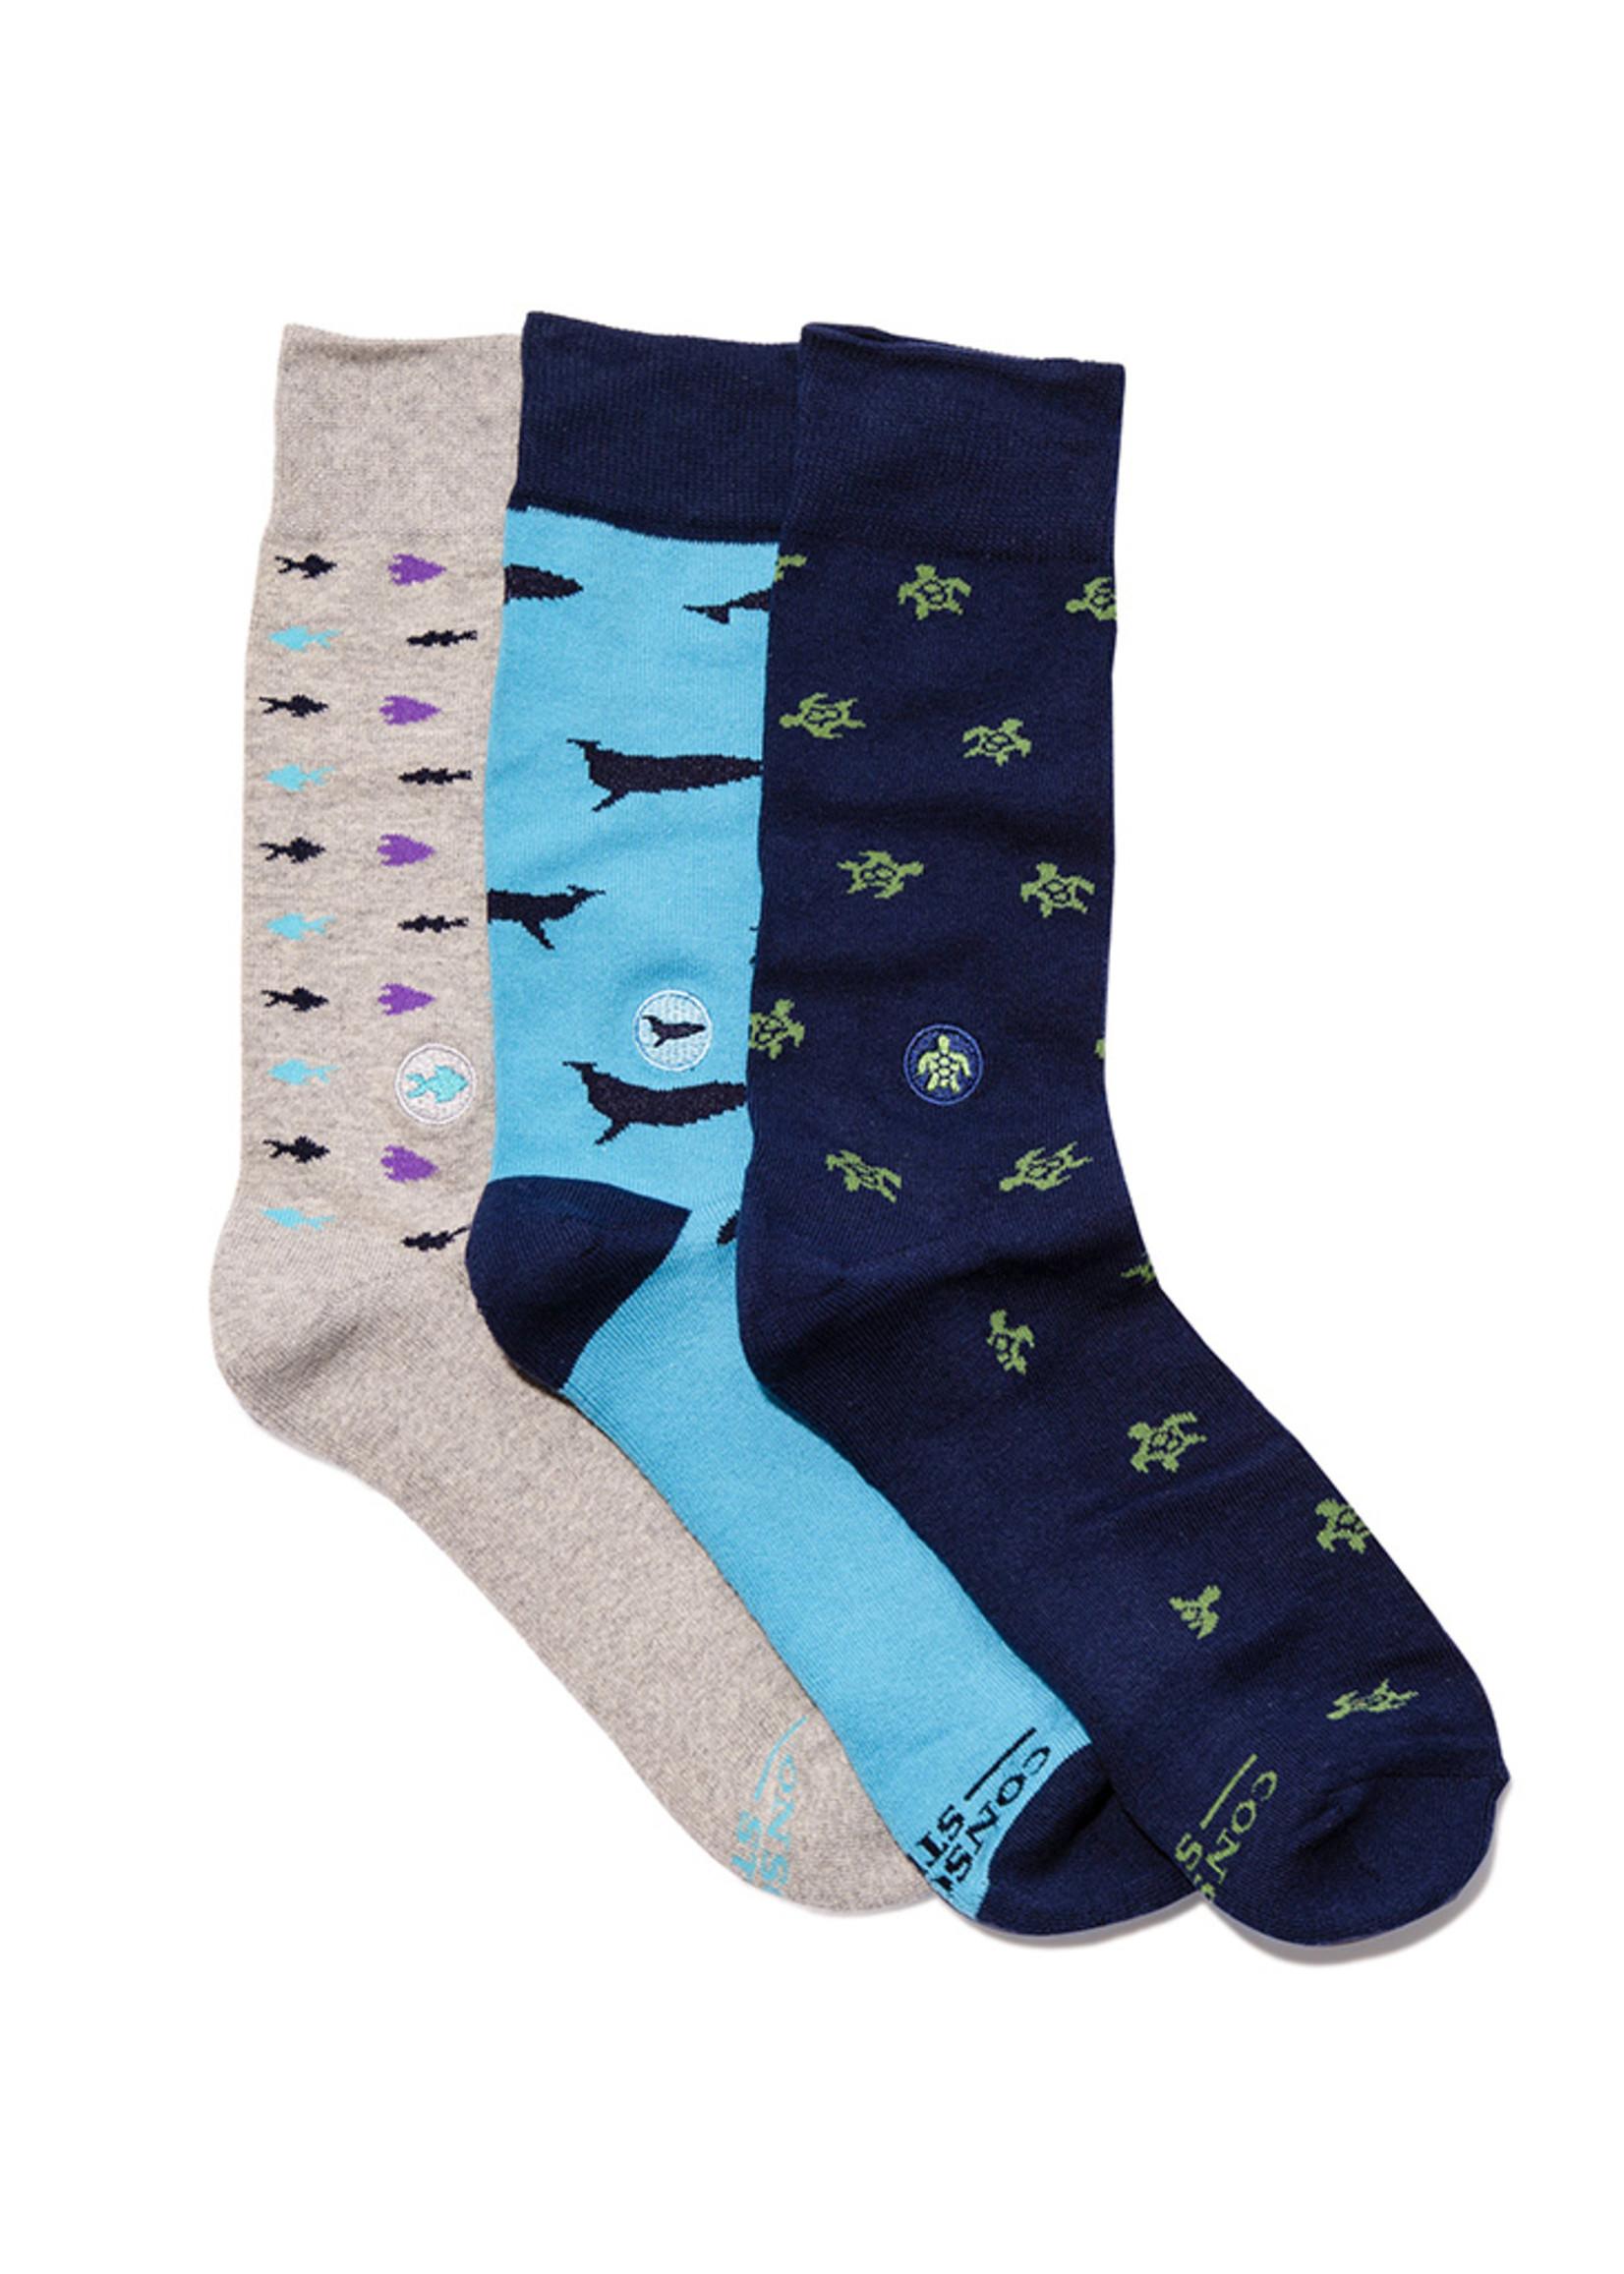 Conscious Step Men's Box of Socks That Protect Ocean Animals